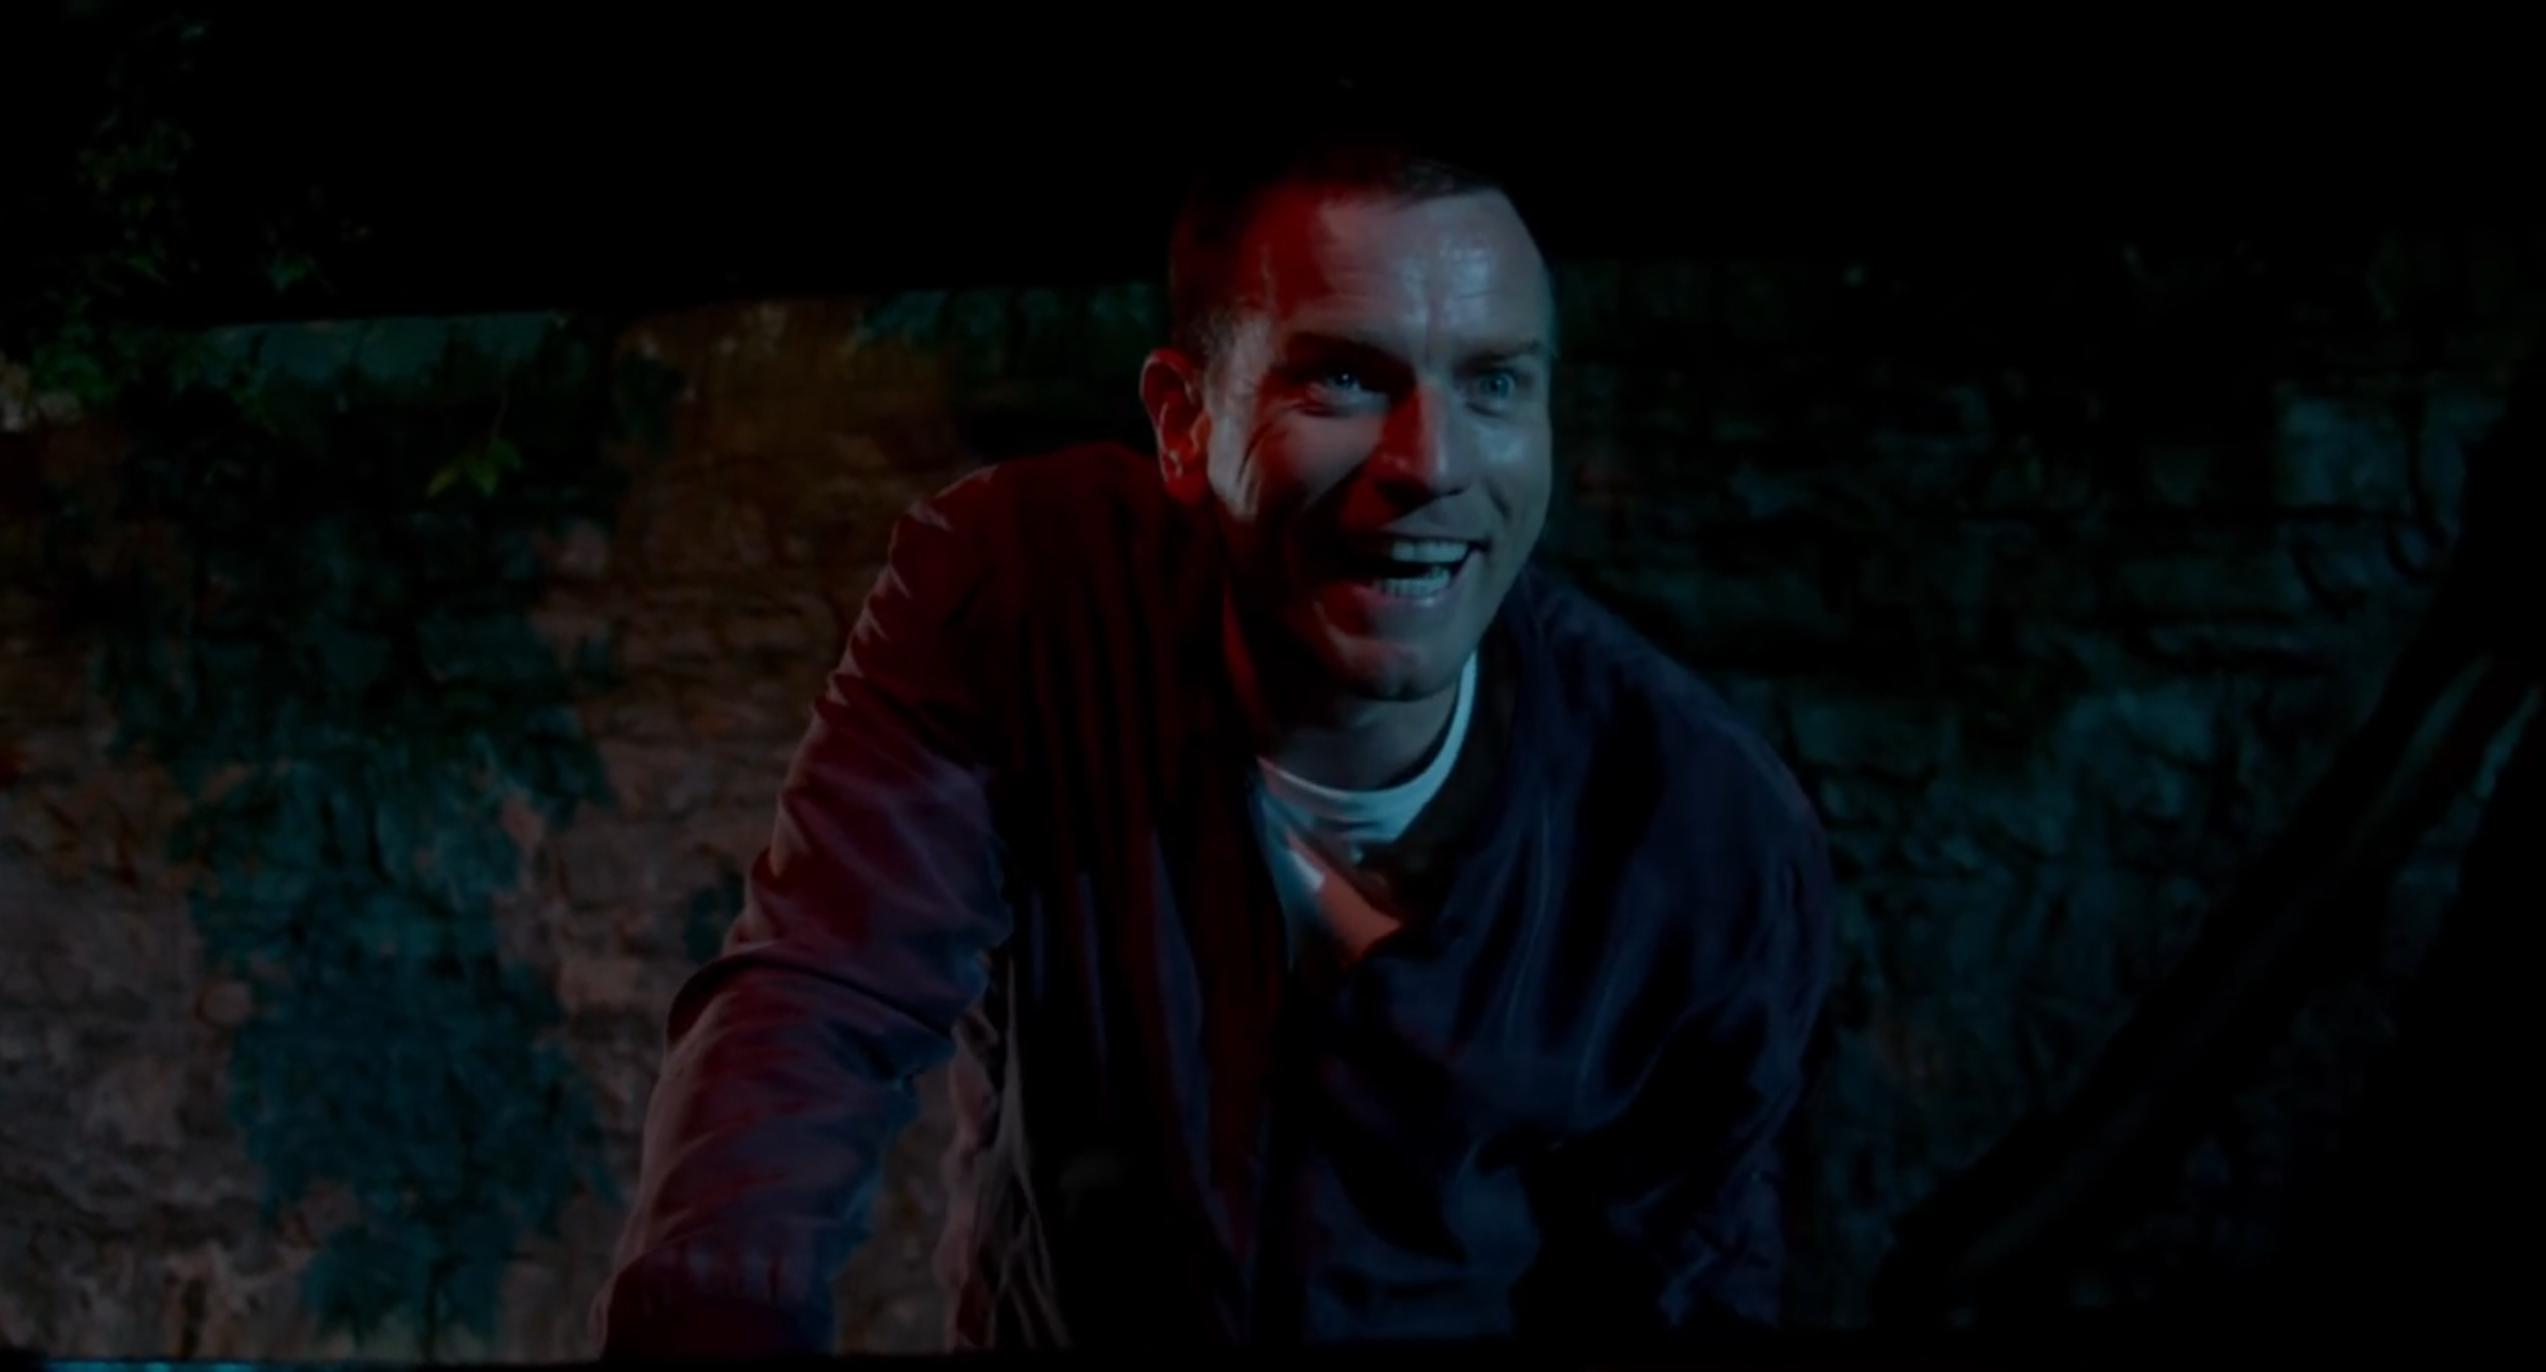 T2: Trainspotting 2 - Ewan McGregor sorride in un'immagine del trailer del film